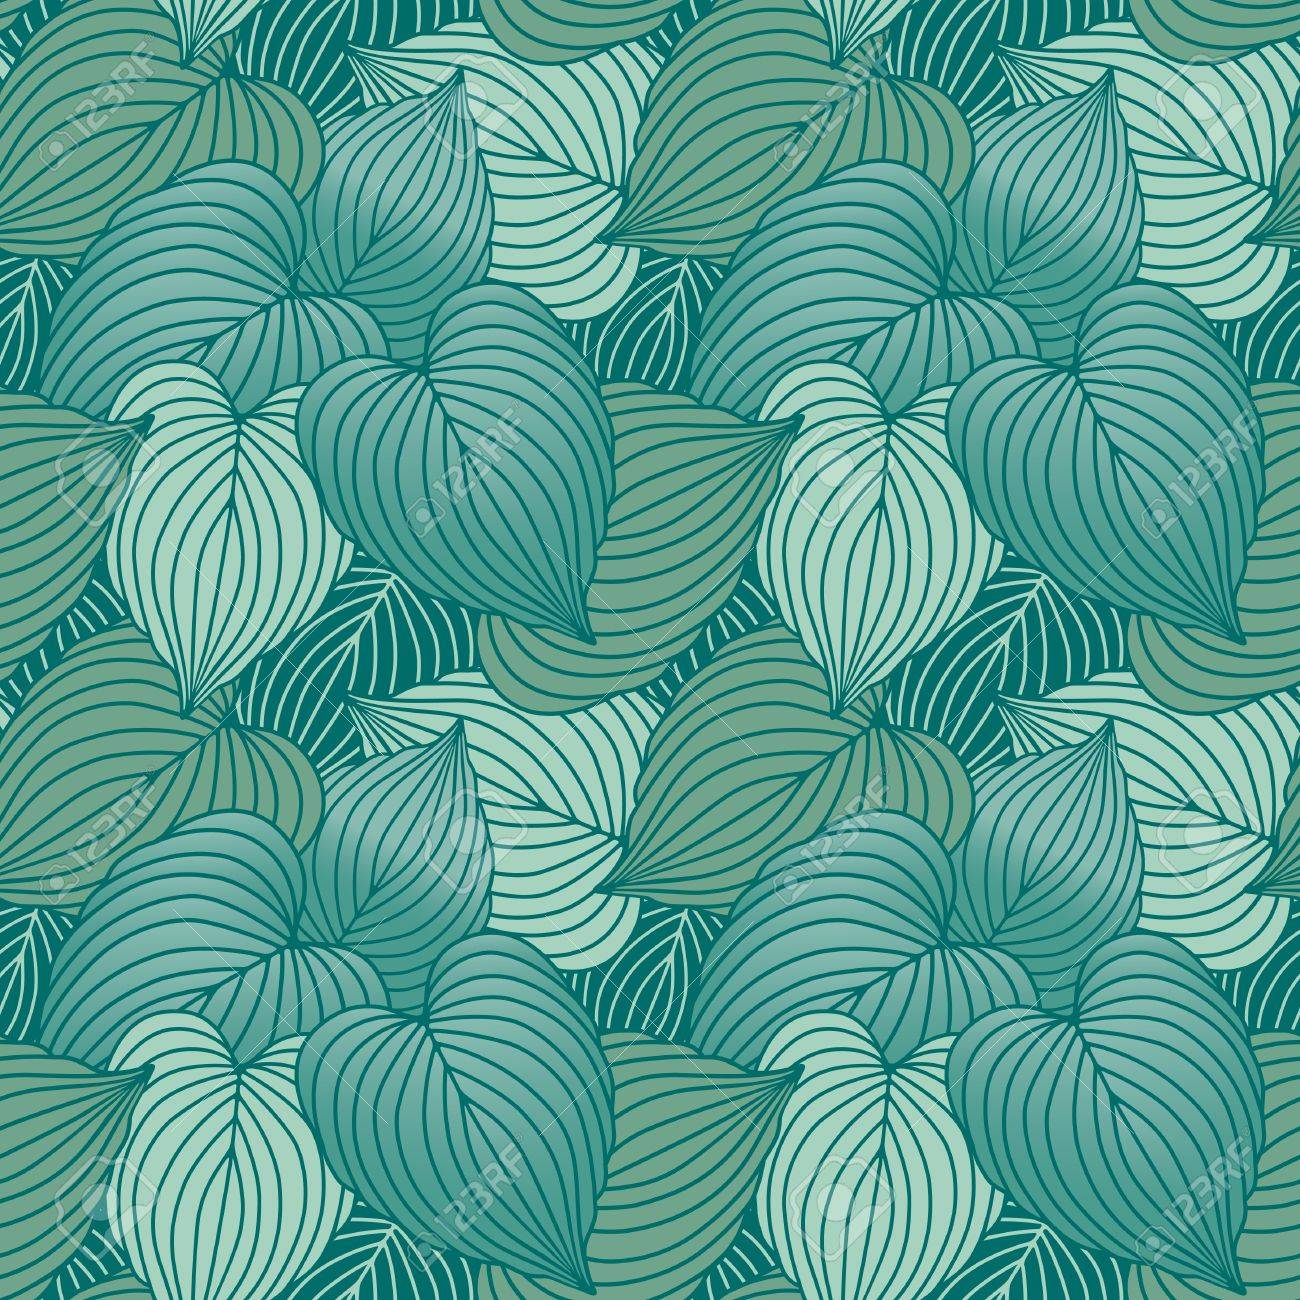 Vector Seamless Pattern Of Blue Green Hosta Plants Royalty Free